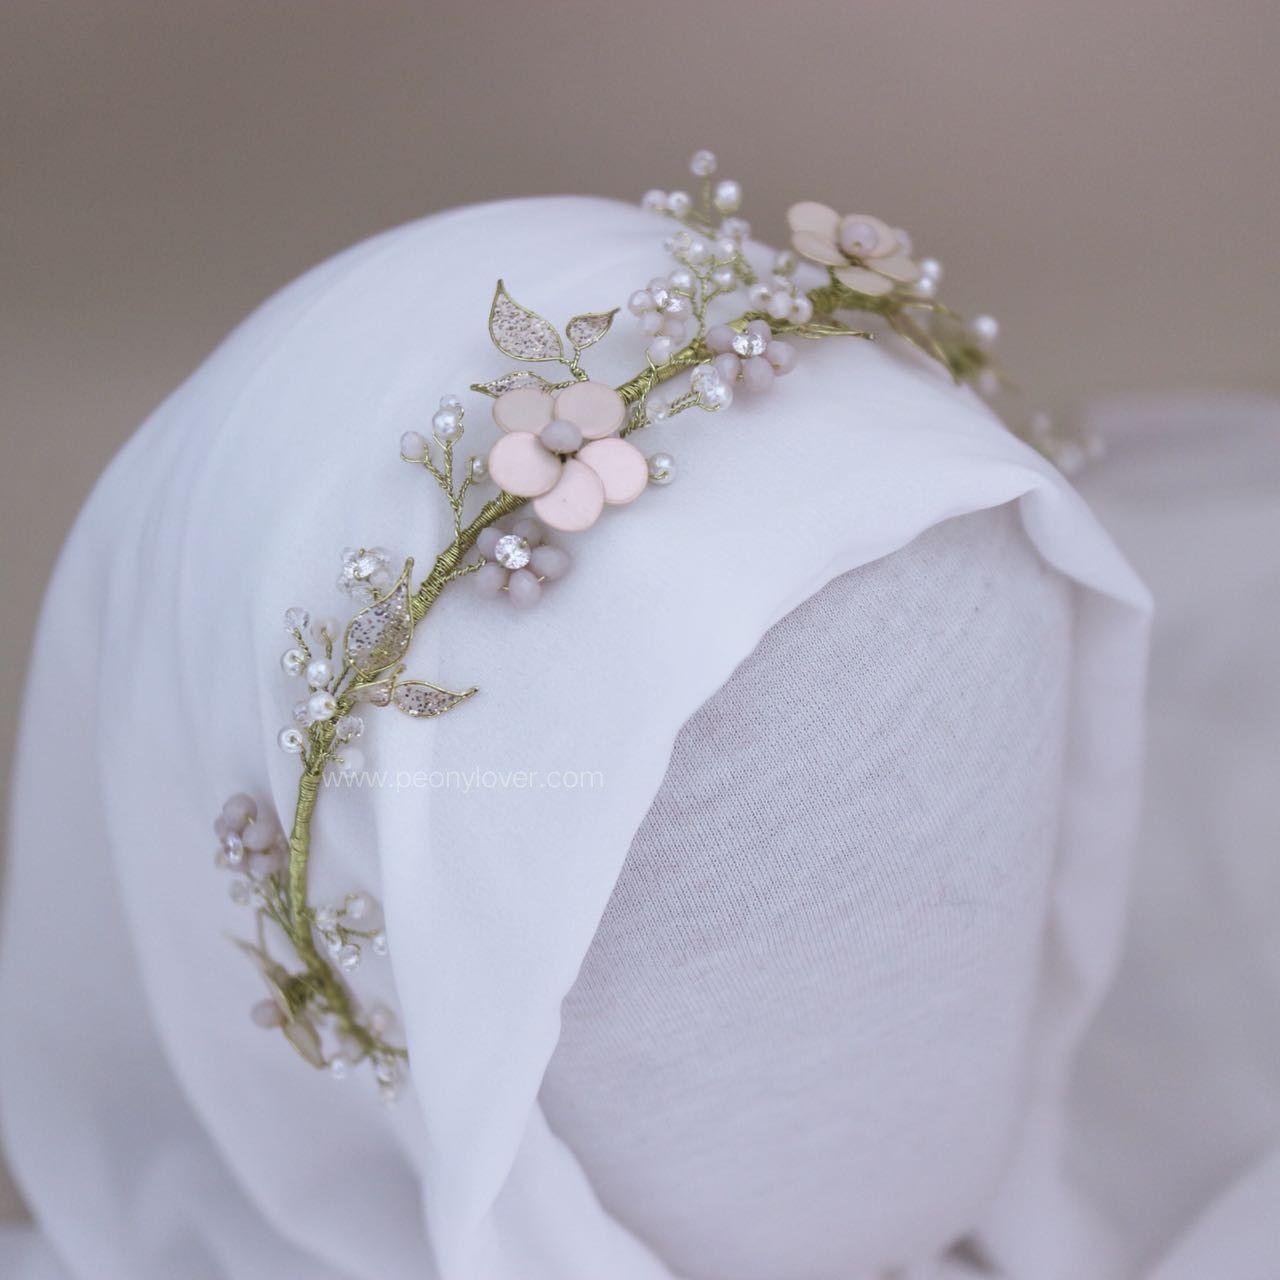 Headpiece Hijab Headpiece Jilbab Headpiece Diy Headpiece Wedding Aksesoris Hijab Wedding Flower Hair Pieces Bridal Flower Headpiece Bride Floral